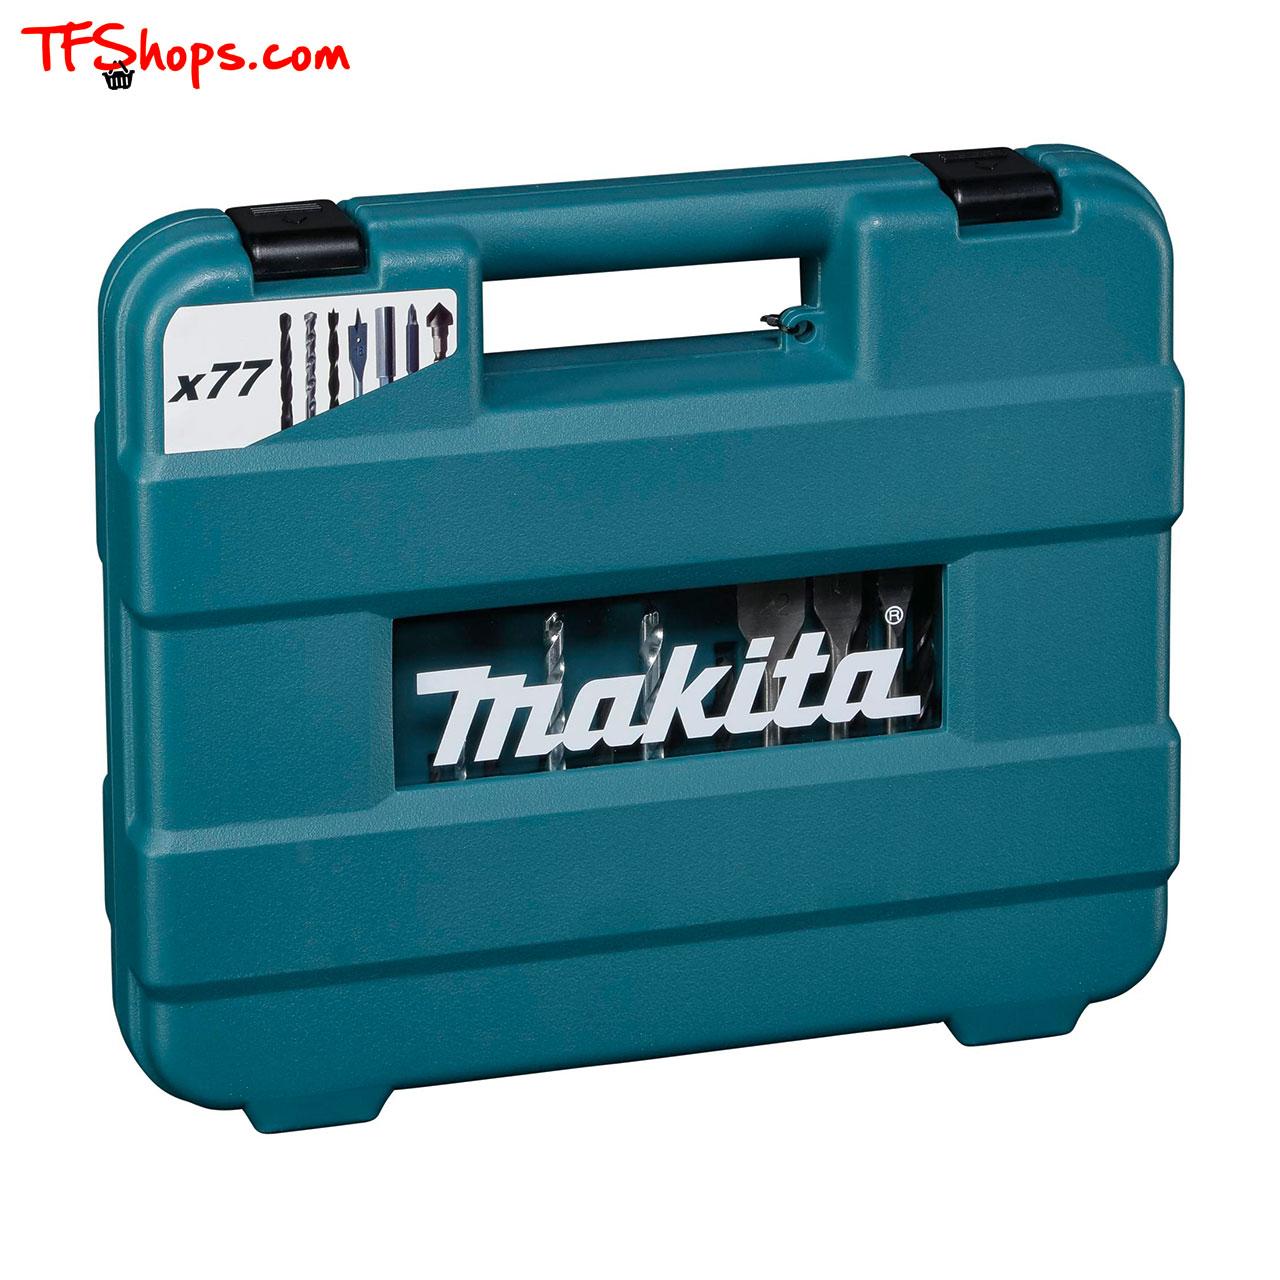 مجموعه 77 عددی مته و سرپیچگوشتی ماکیتا مدل D-47226